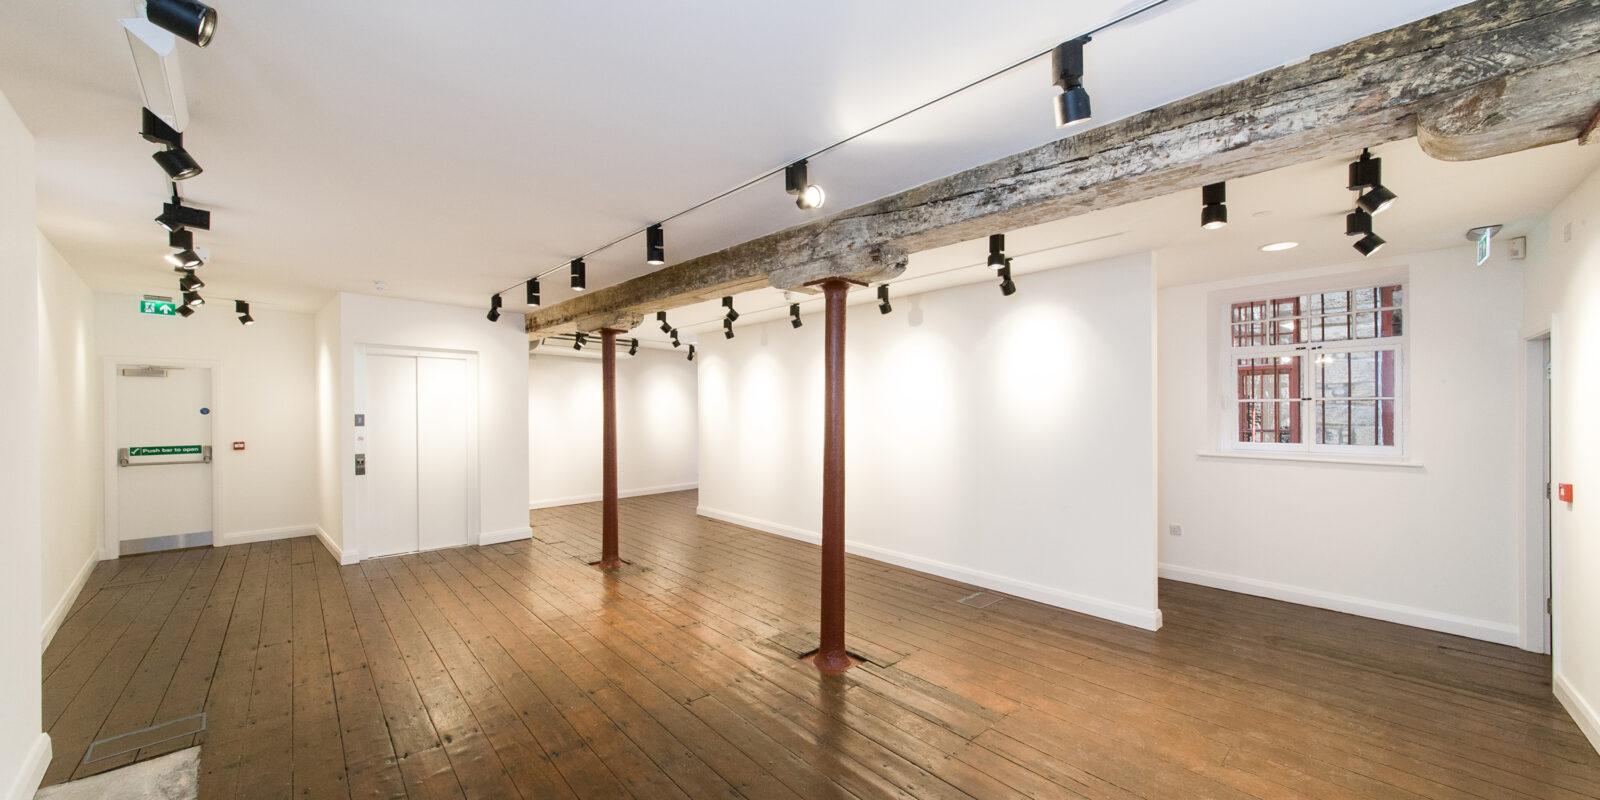 Refurbishment of Side Gallery